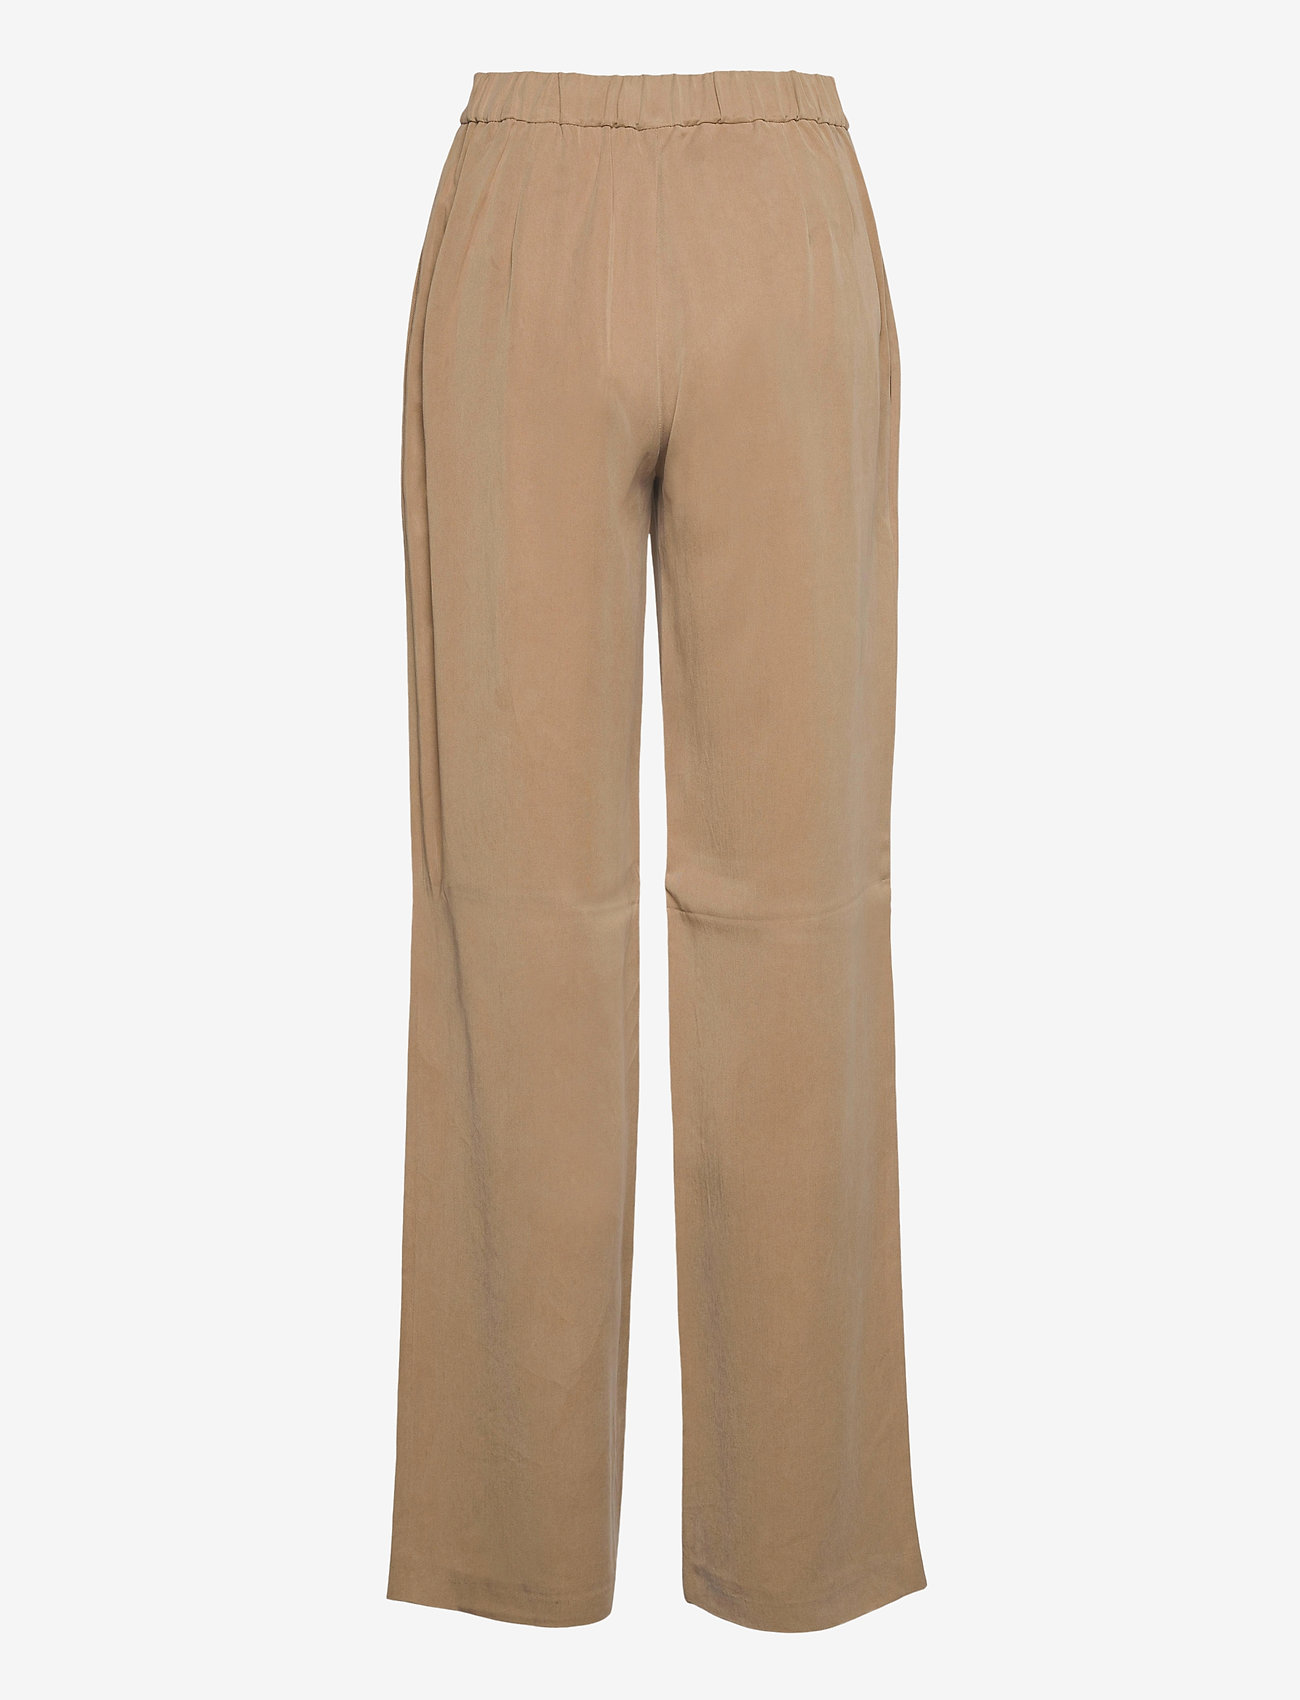 HUGO - Hibari-1 - pantalons larges - light beige - 1